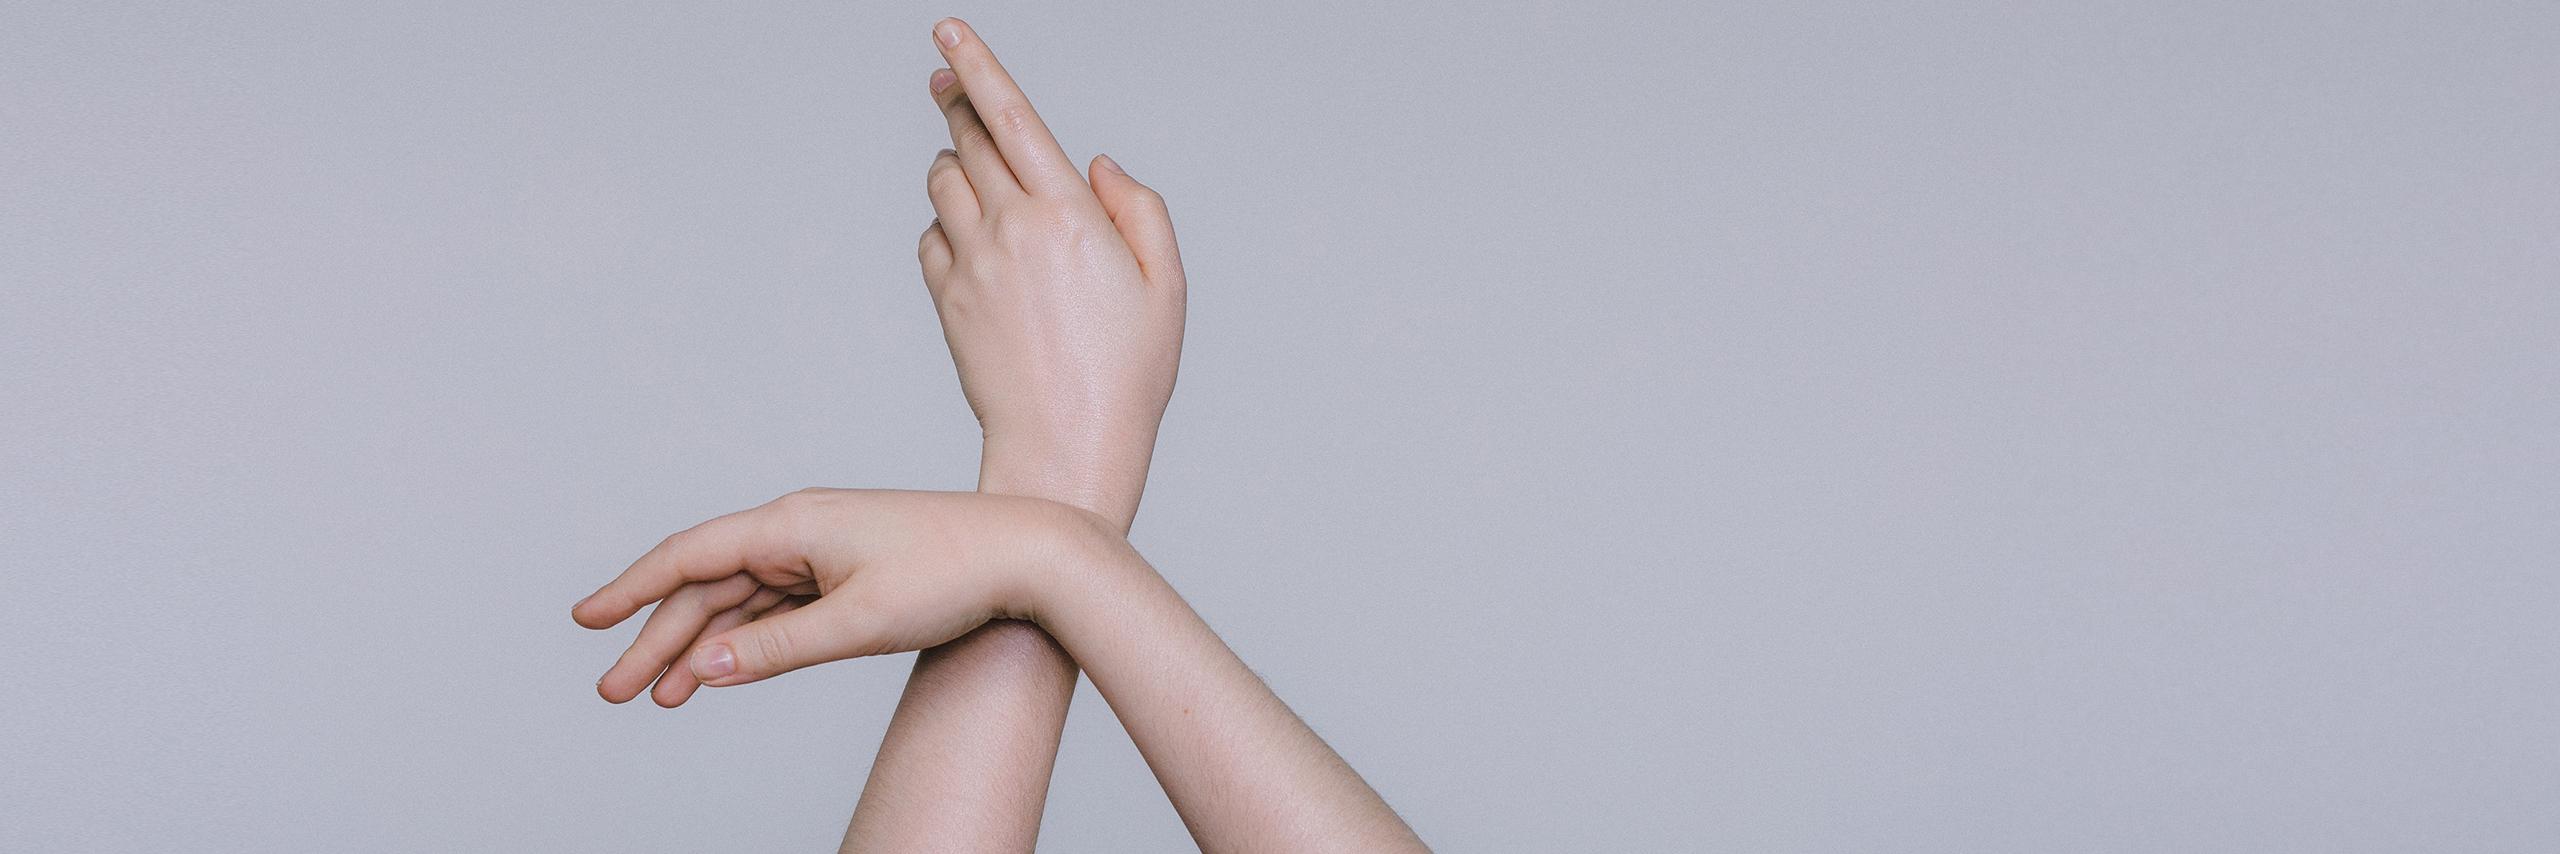 Rejuvenating Hand Treatments